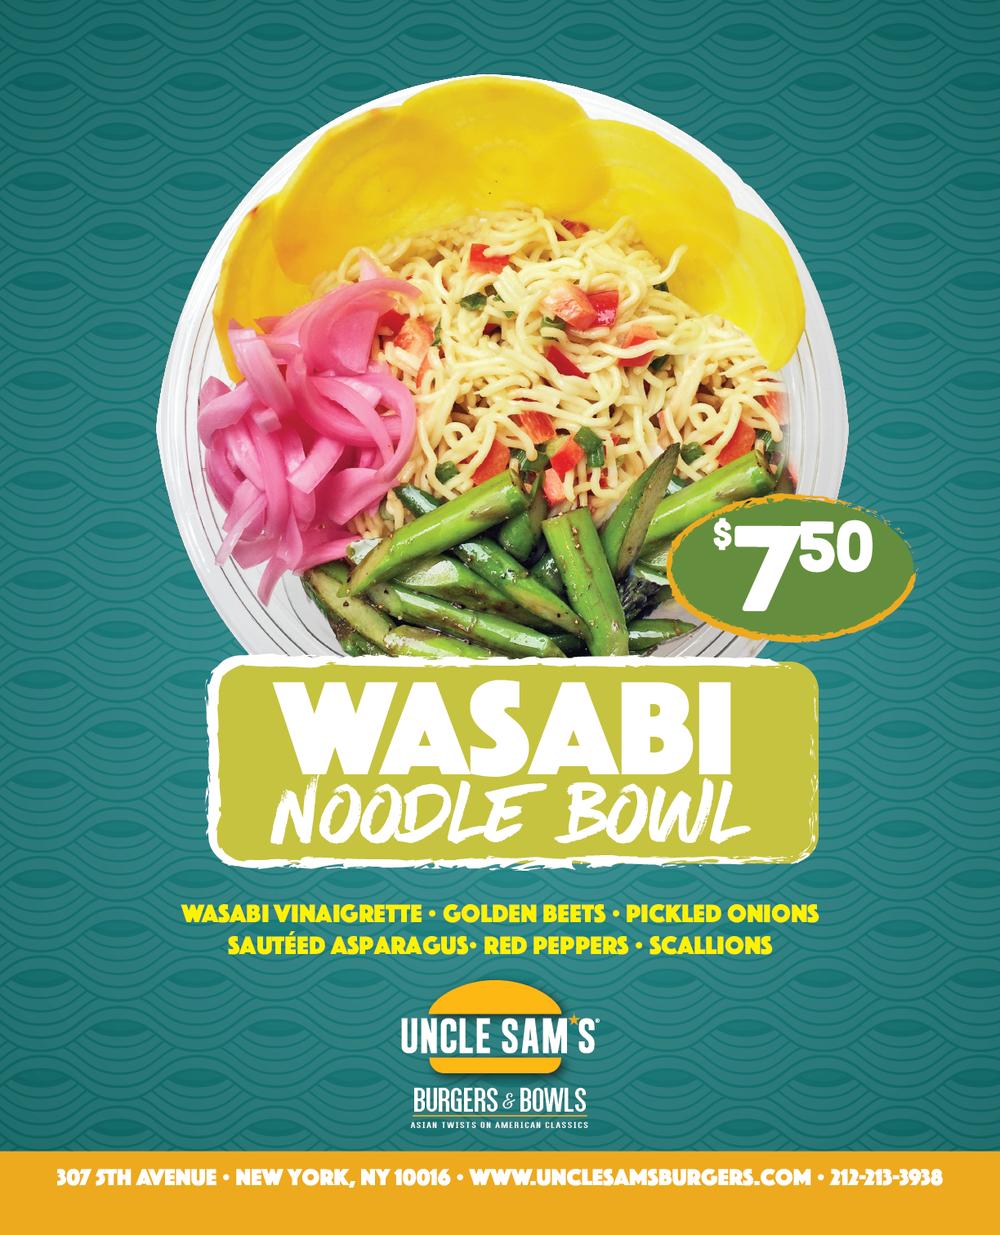 Wasabi Noodle Bowl Tech Frame-01.png